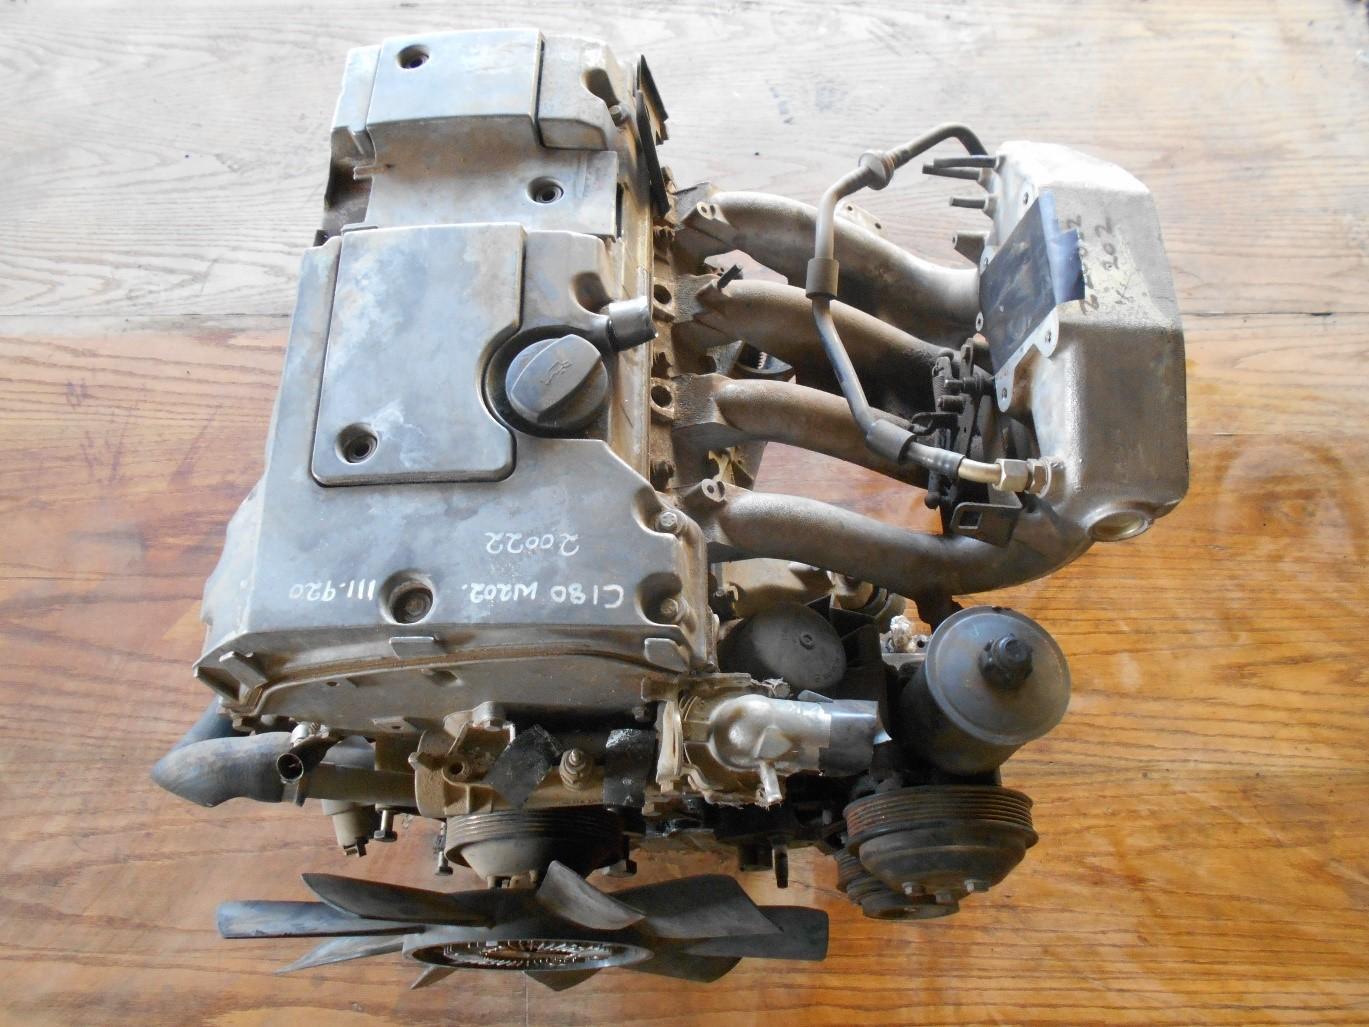 Mercedes Benz c180 1998 - 2002 _ 111 920 Engine For Sale